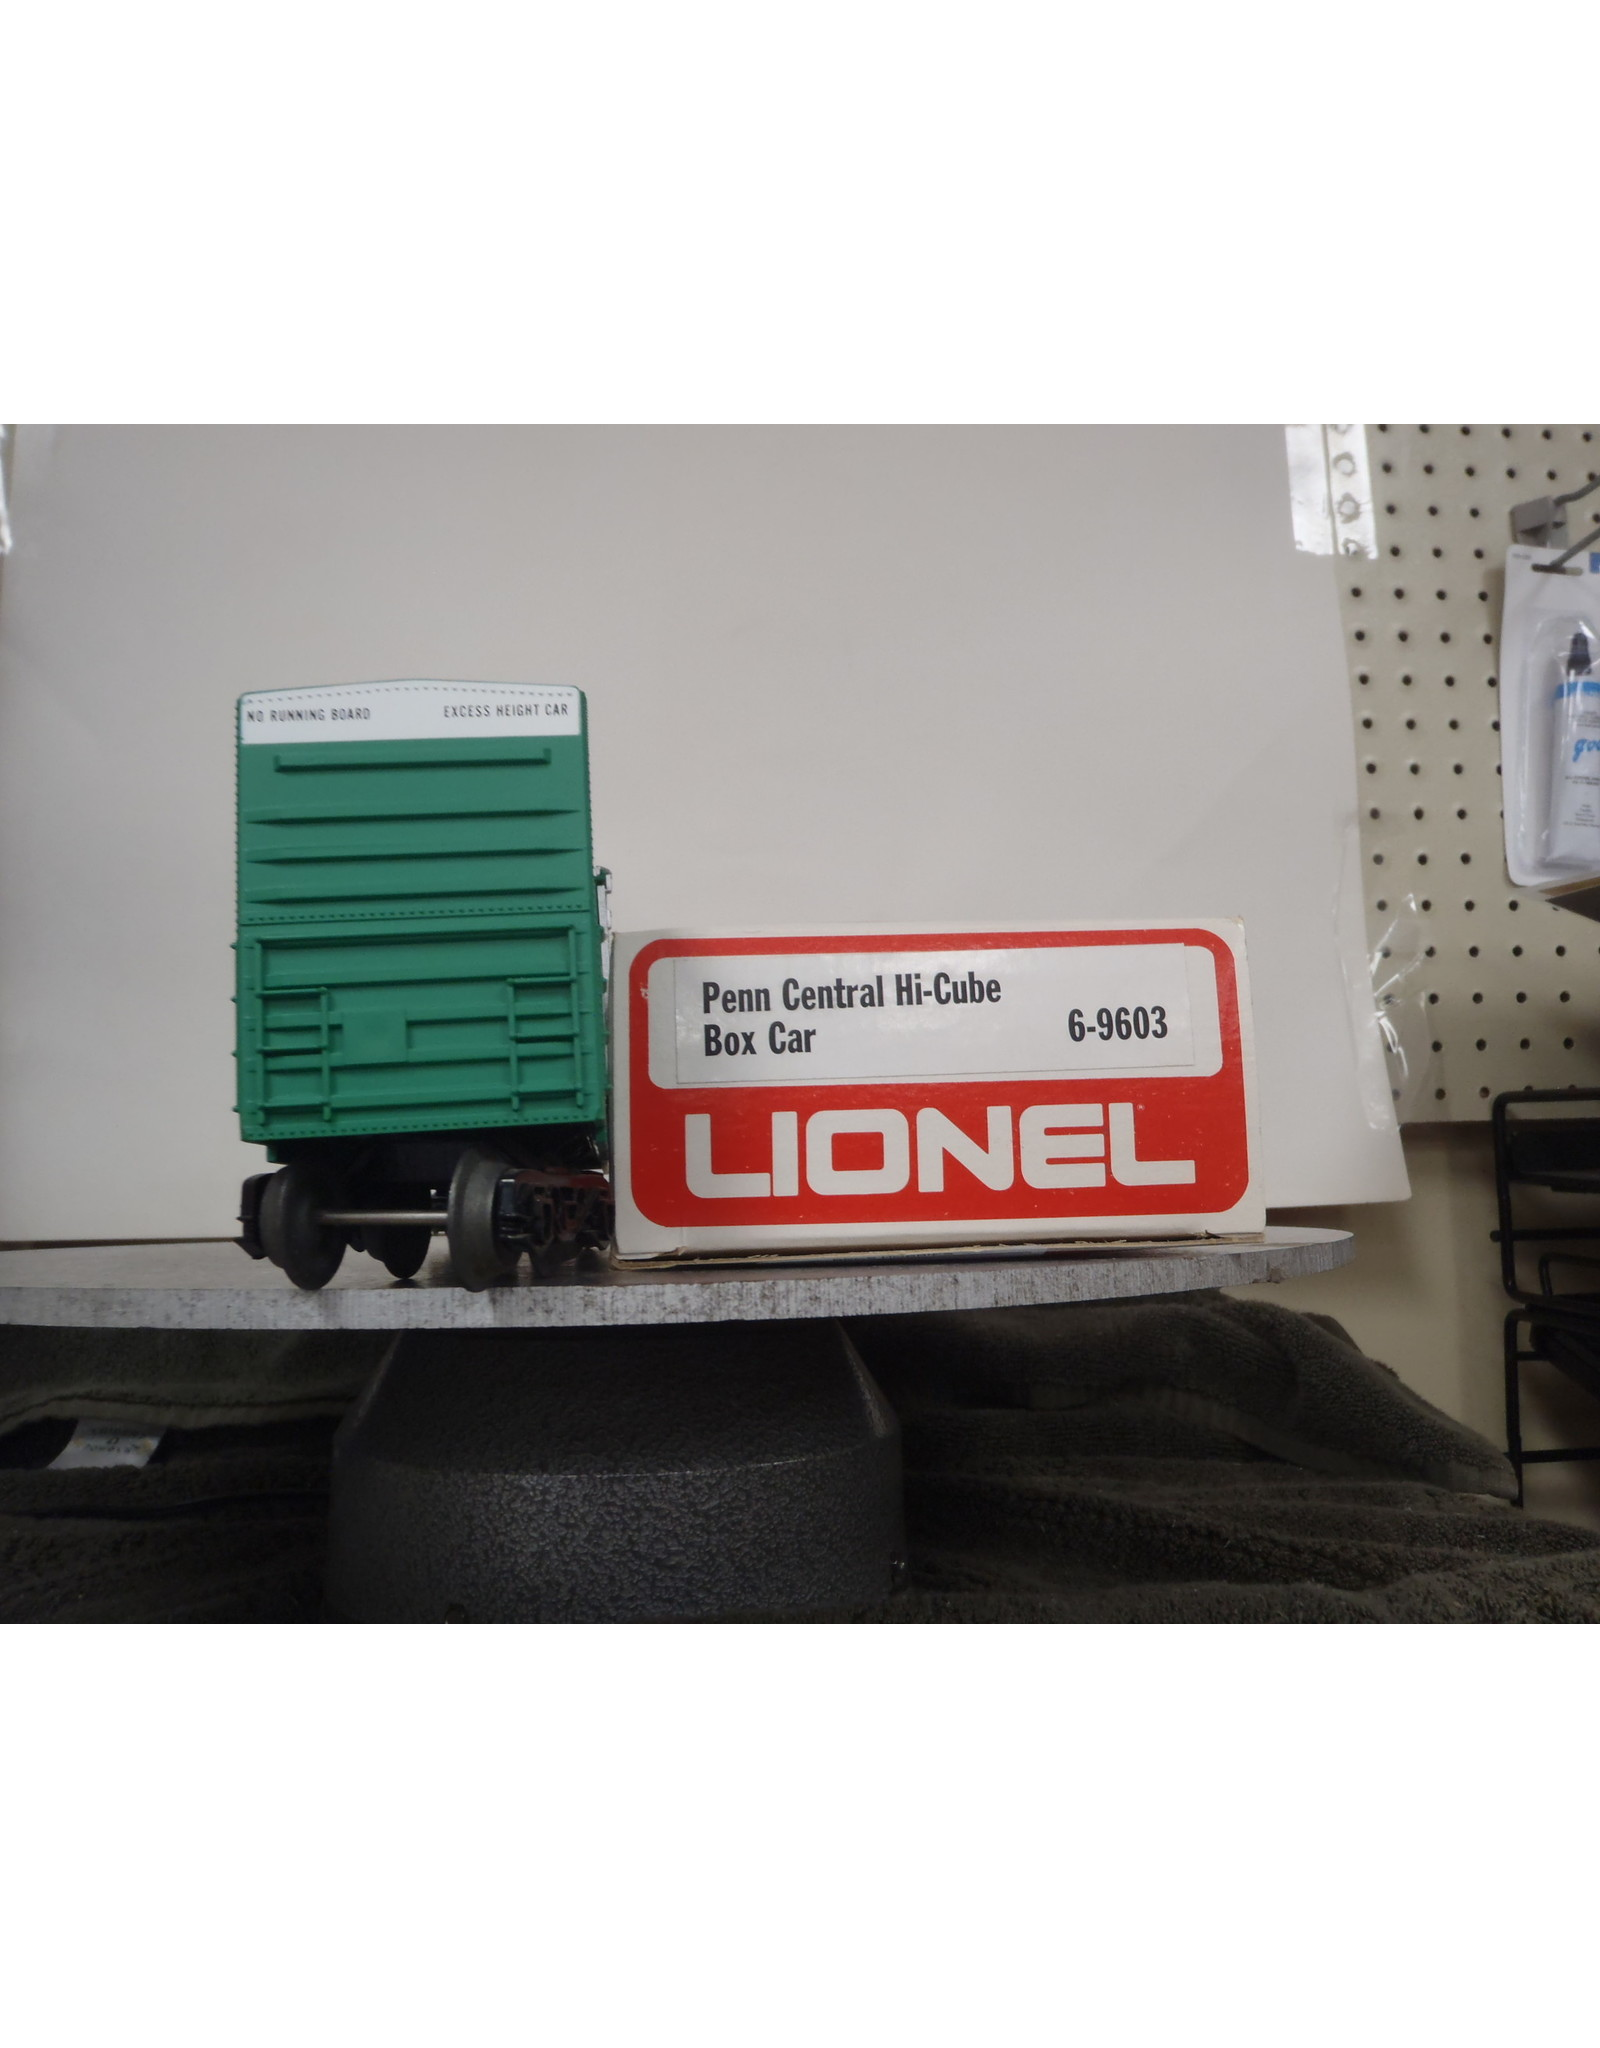 Lionel Boxcar Hi-Cube Penn Central 9603